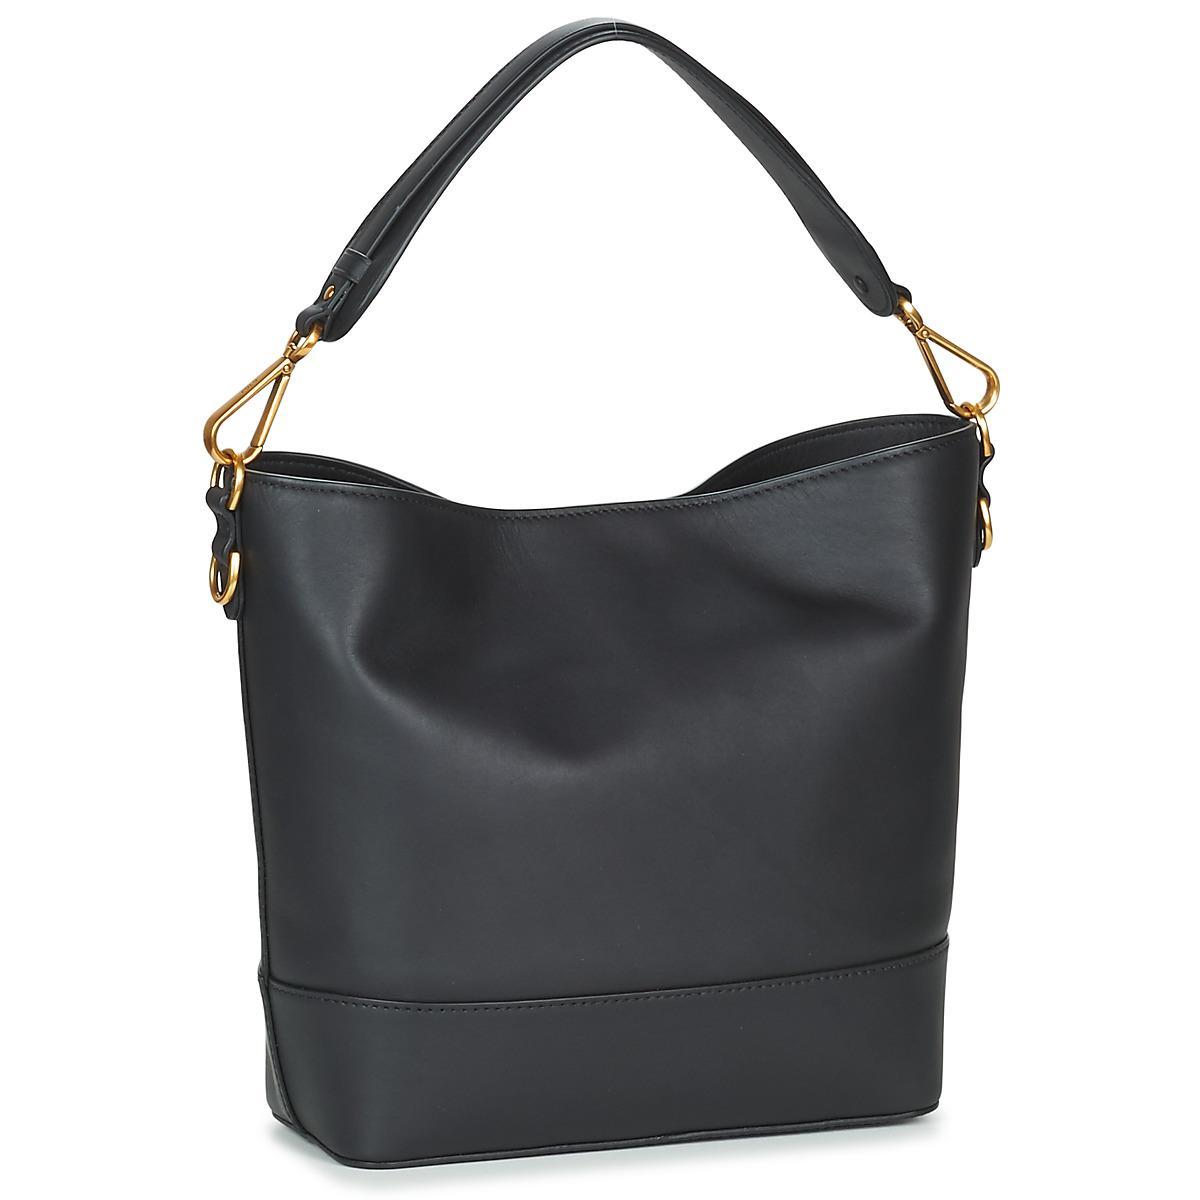 88c2c49f98 Polo Ralph Lauren - Sullivan Women s Shoulder Bag In Black for Men - Lyst.  View fullscreen